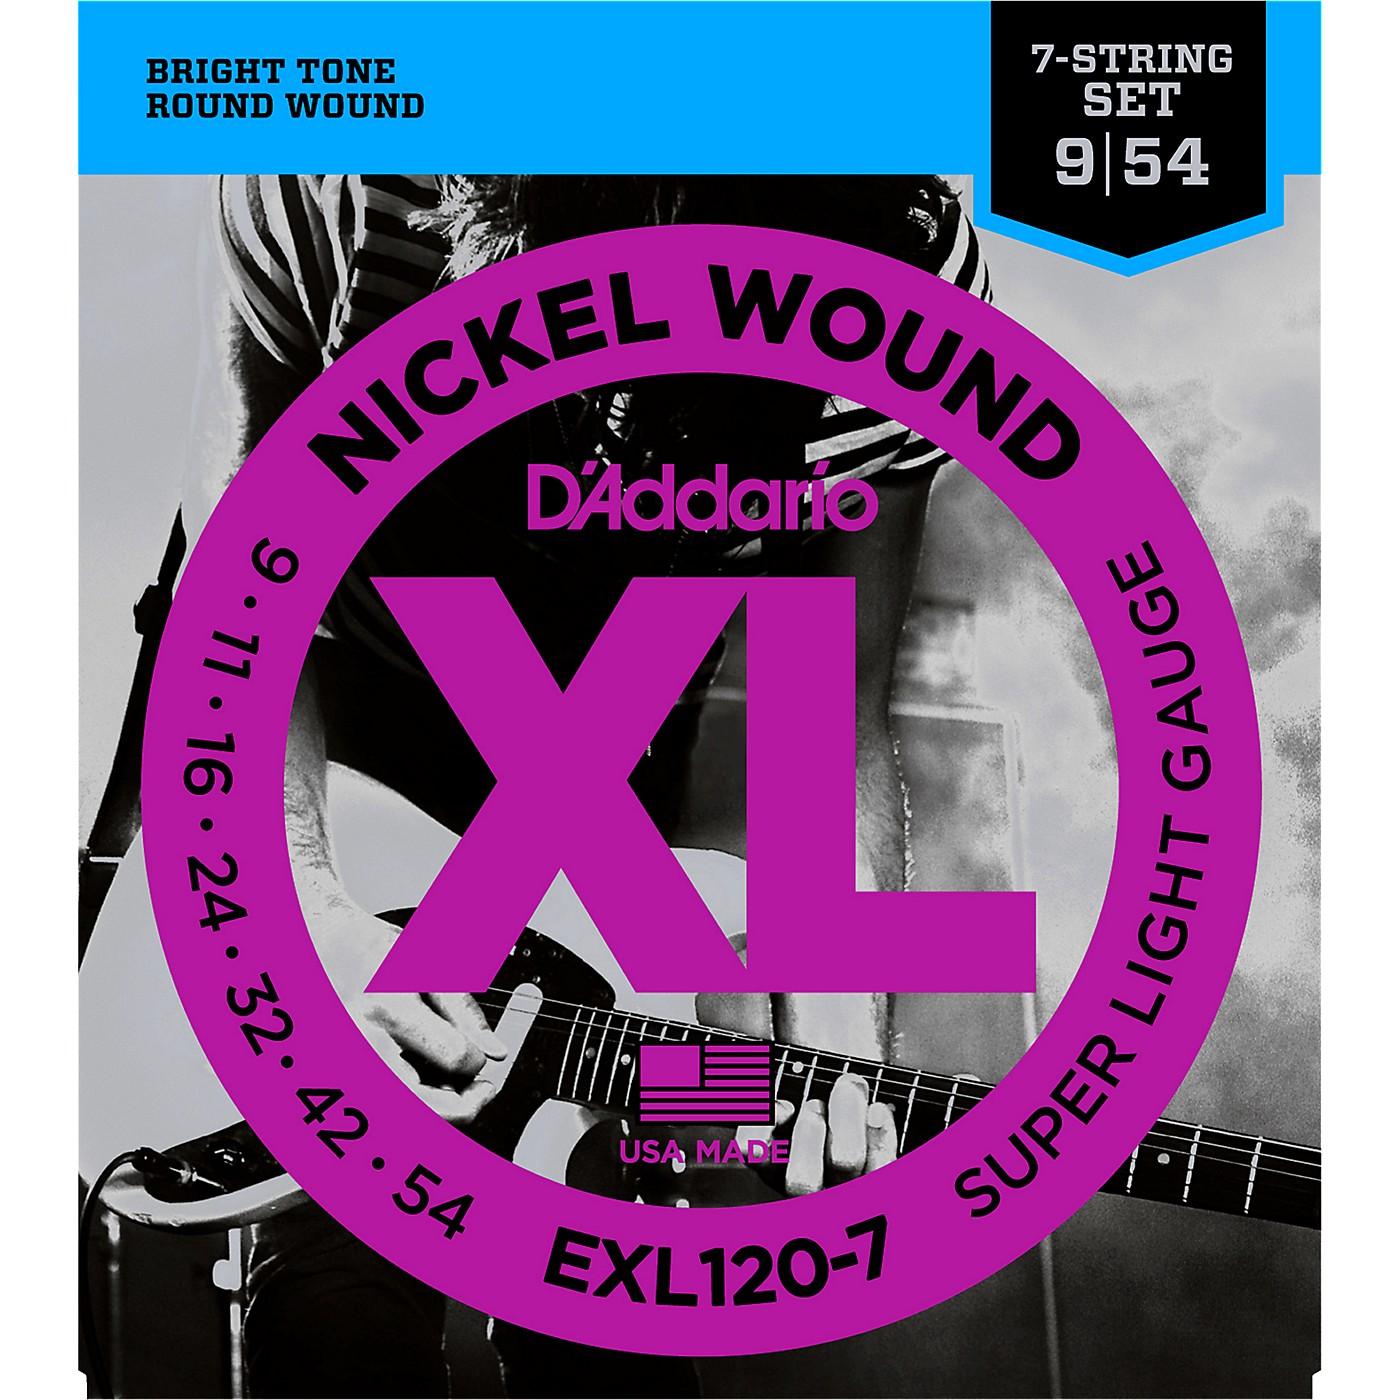 D'Addario EXL120-7 Super Lite 7-String Electric Guitar Strings thumbnail